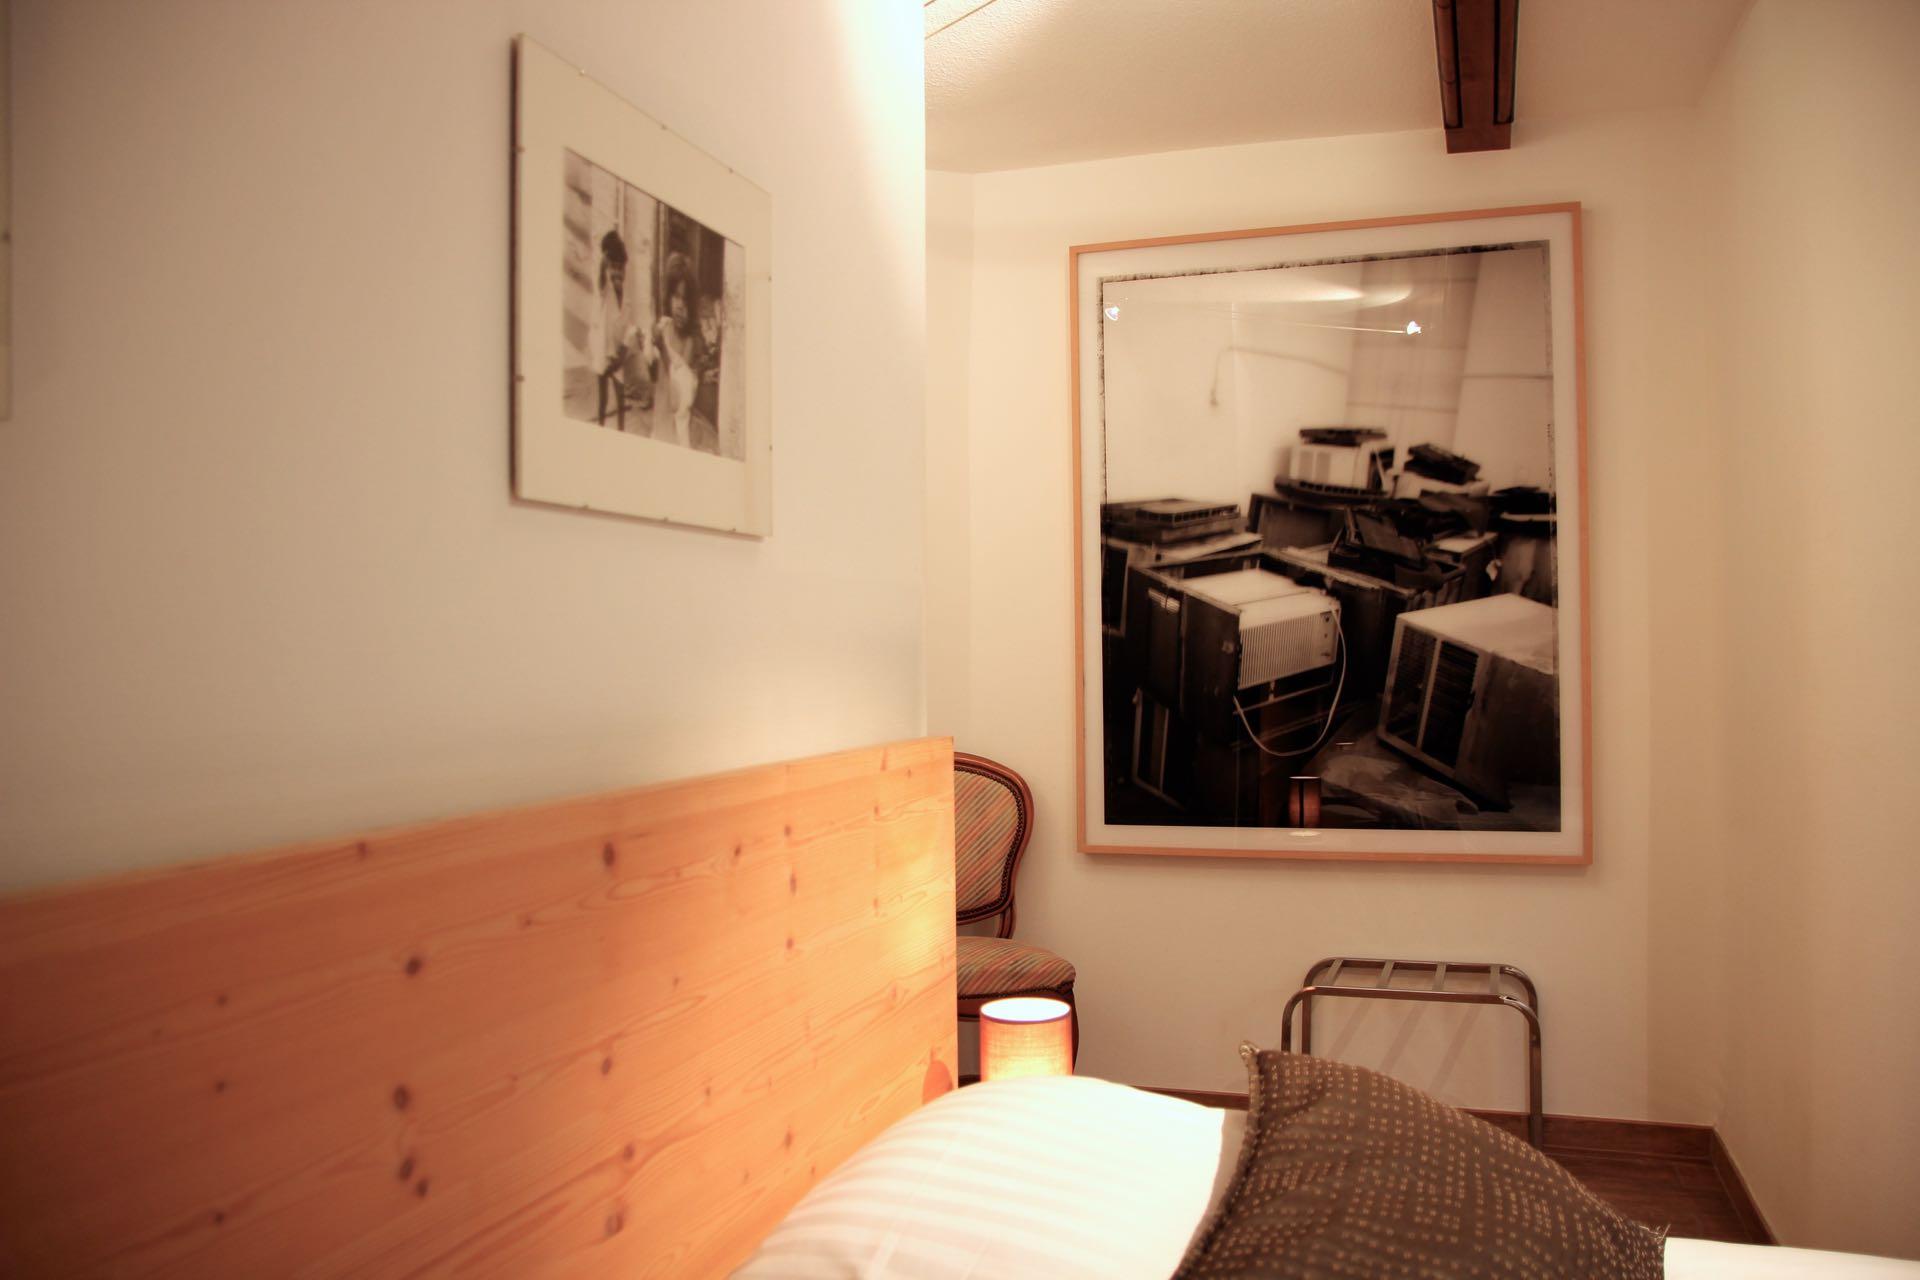 ART-HOTEL 1